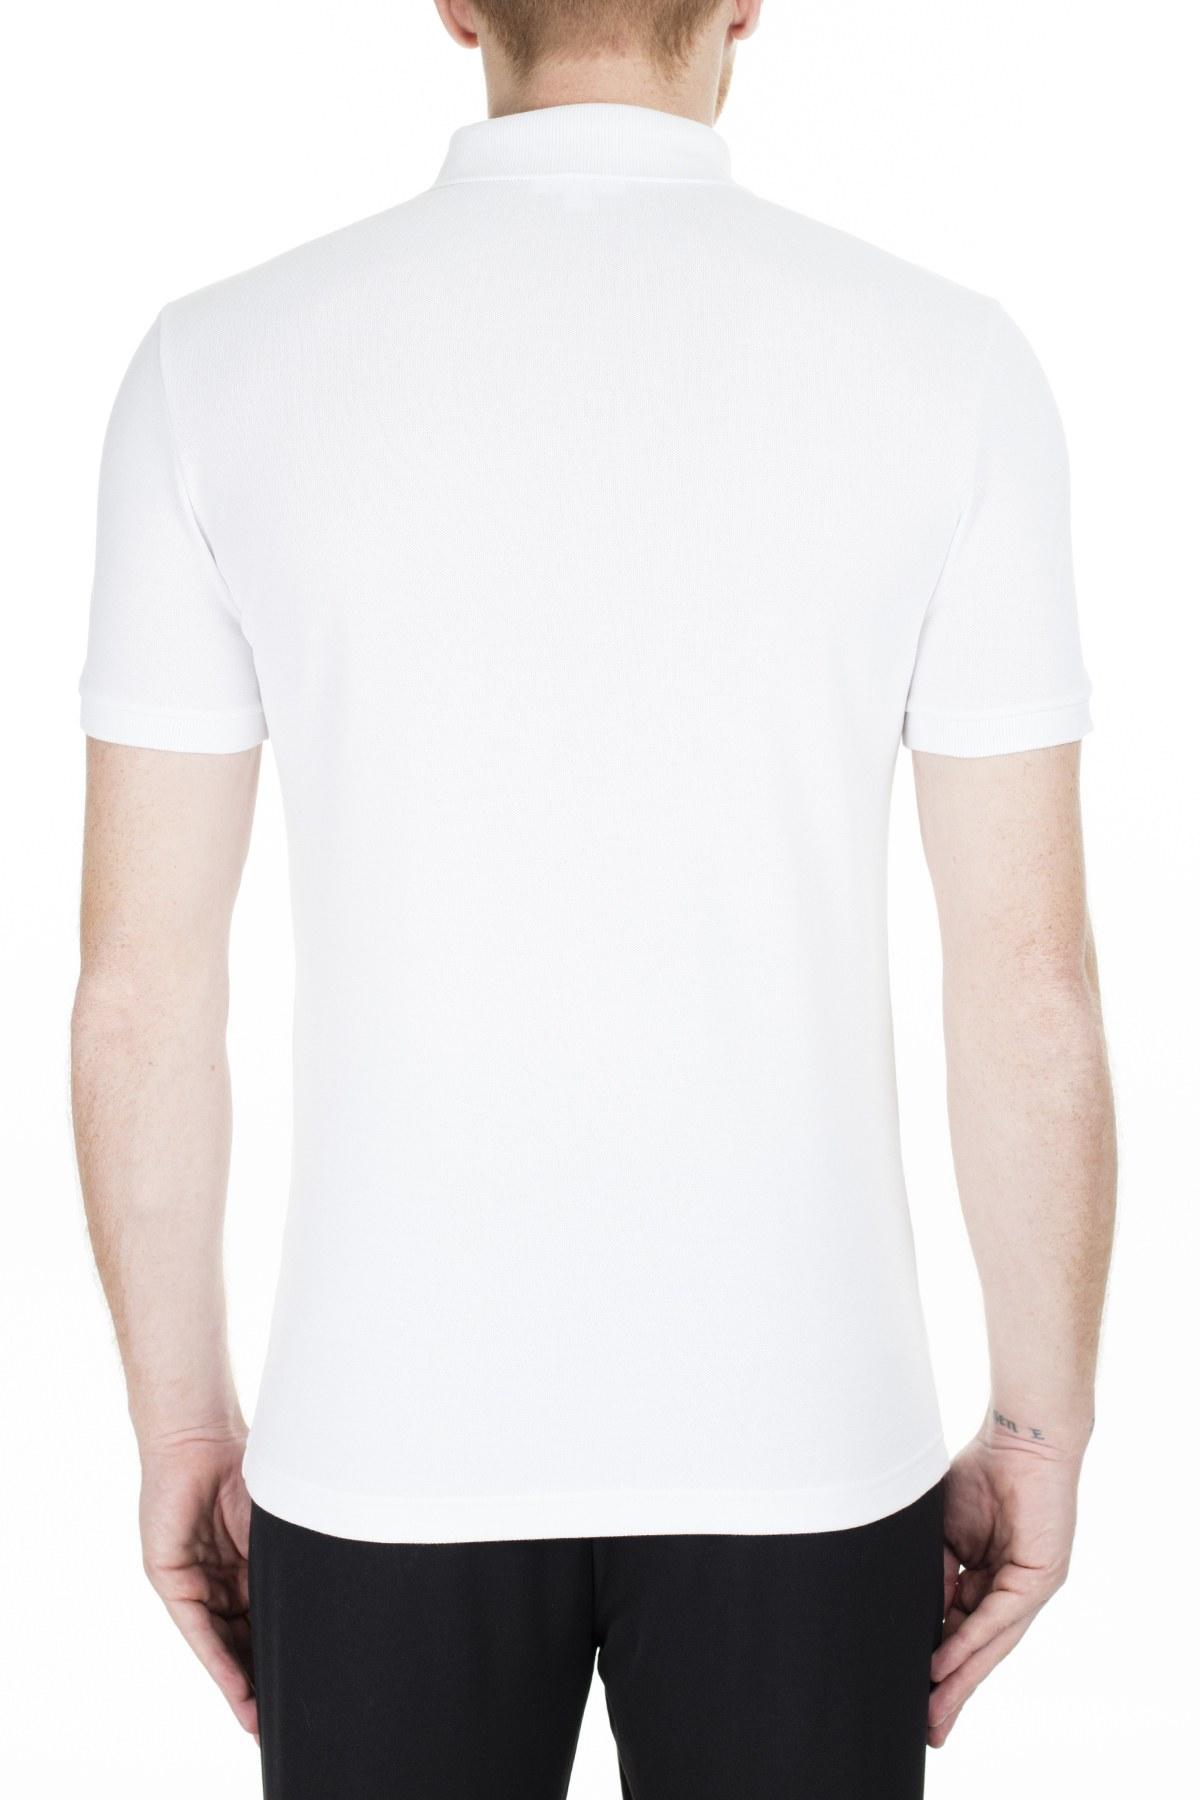 Lacoste Pamuklu Slim Fit T Shirt Erkek Polo PH4014 001 BEYAZ